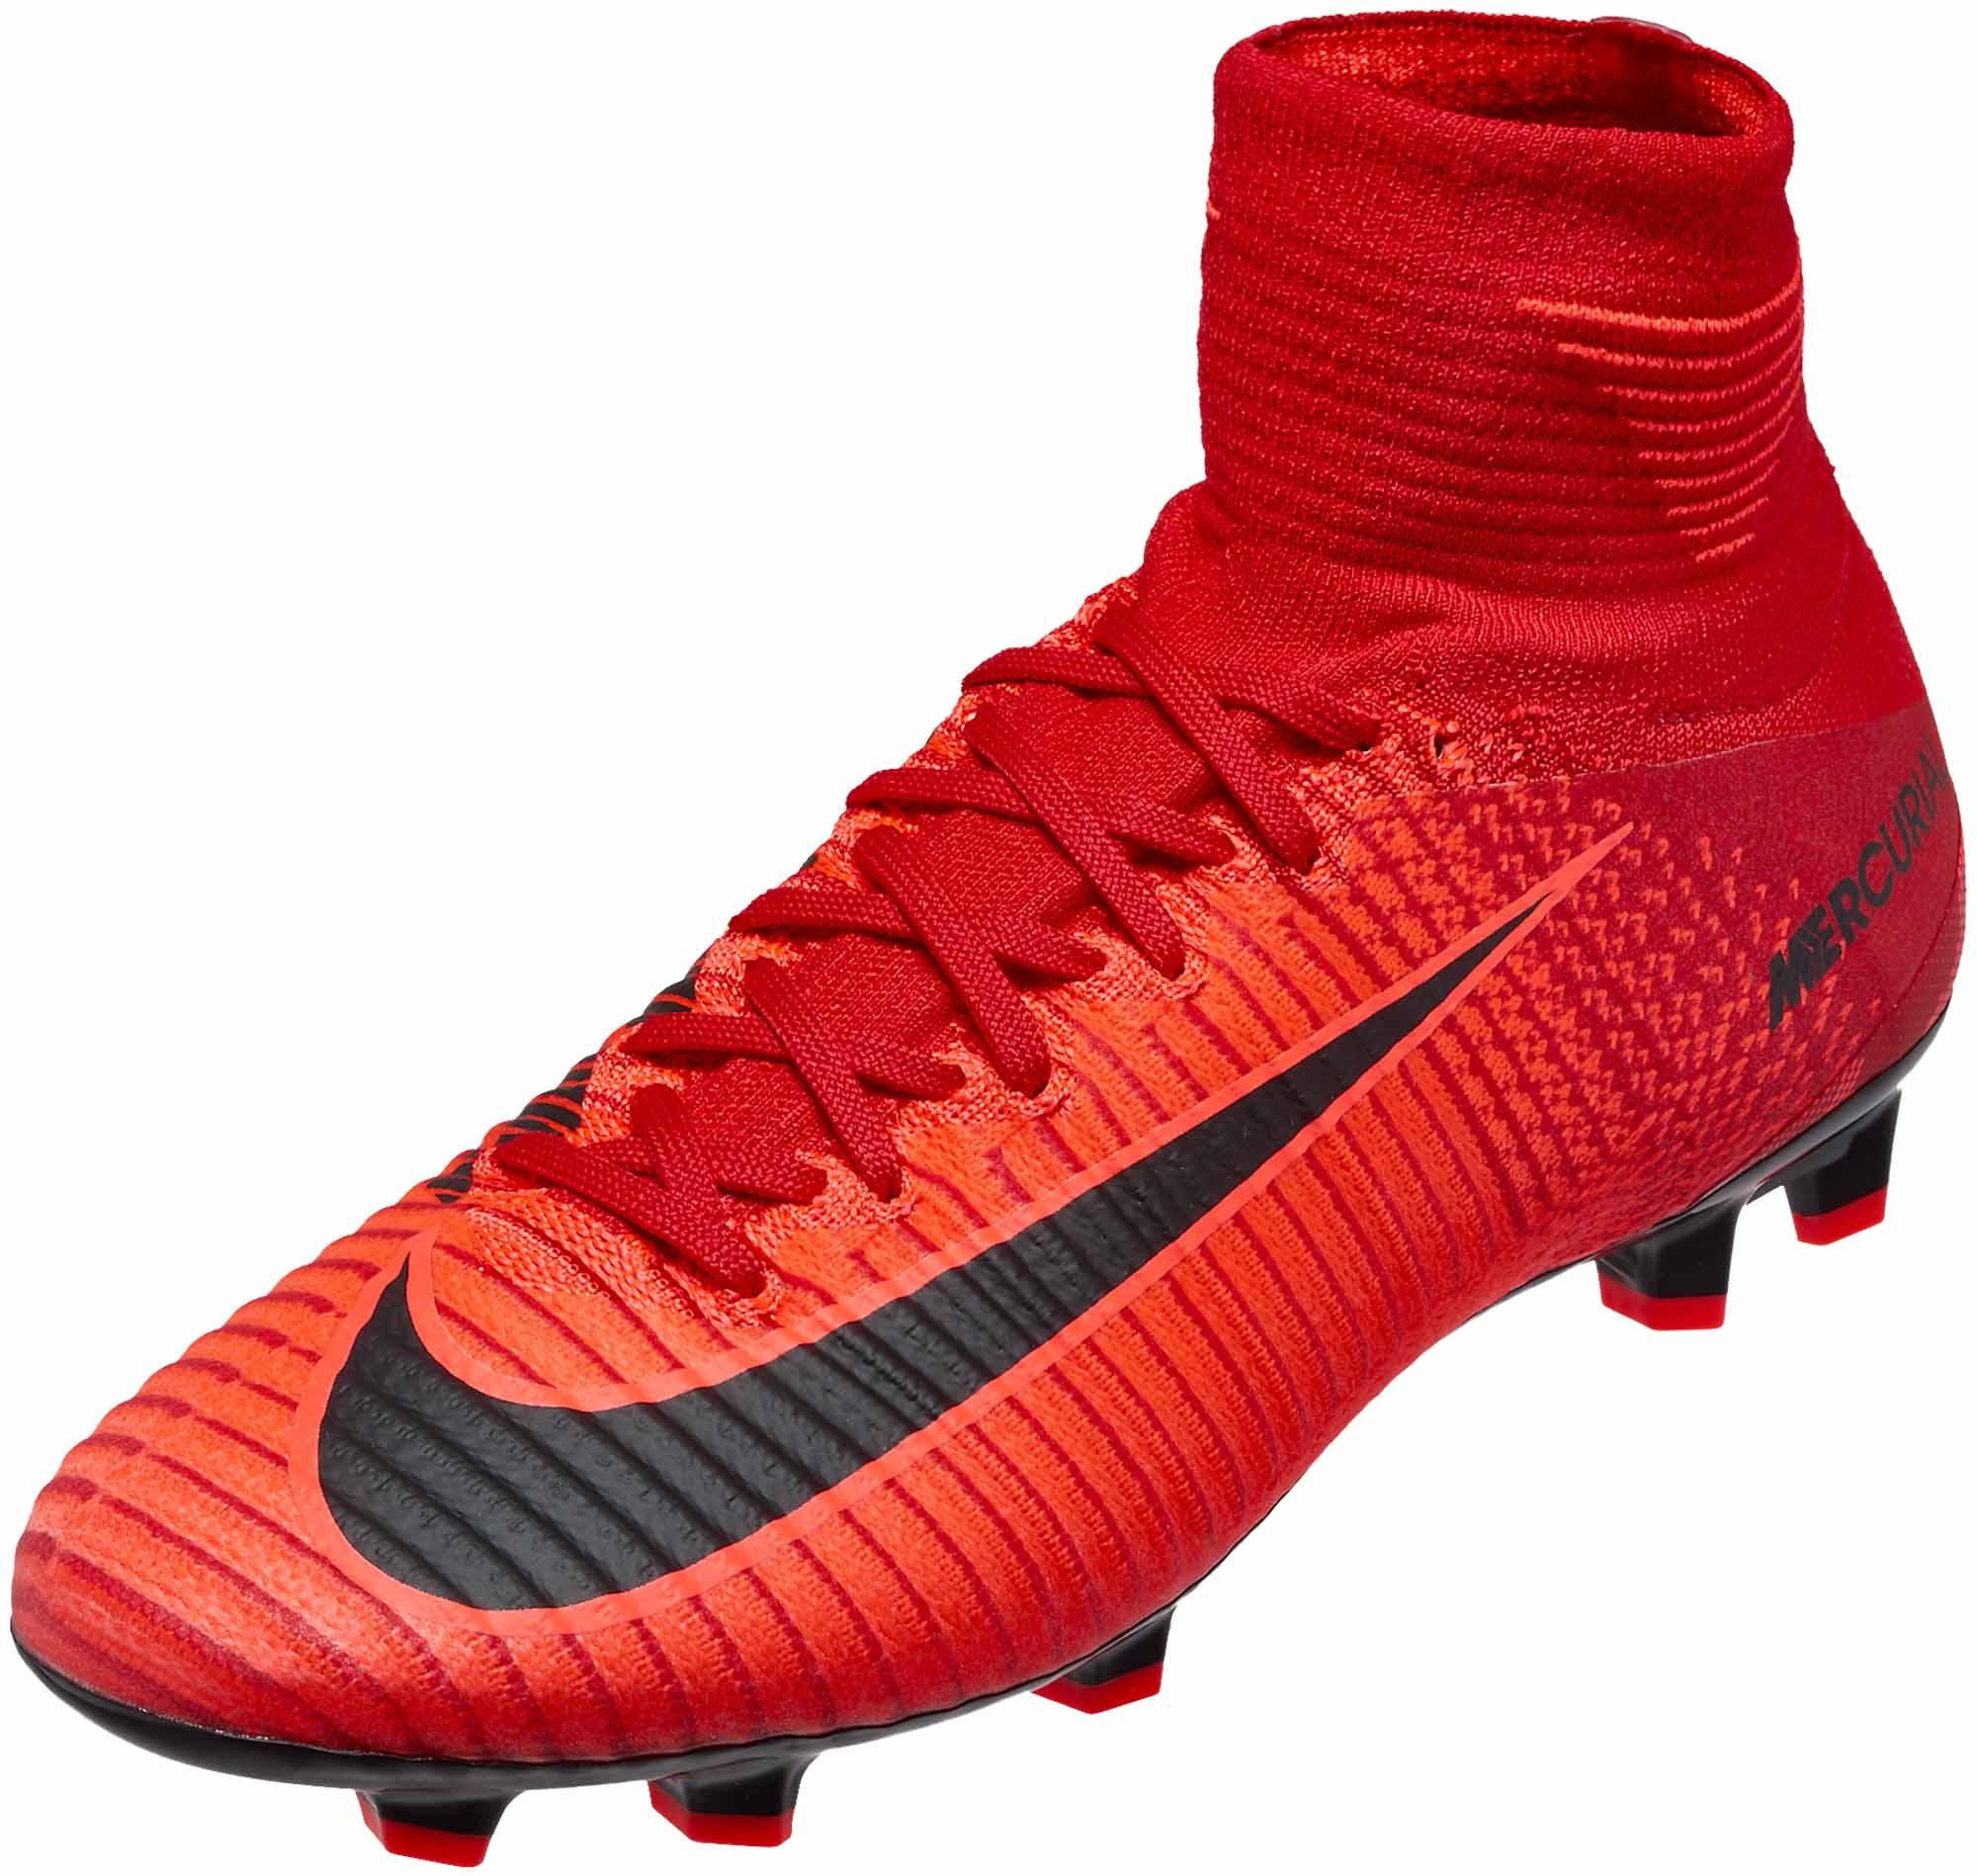 Nike Kids Mercurial Superfly V FG - University Red   Black - Soccer ... f9996d7bfee1